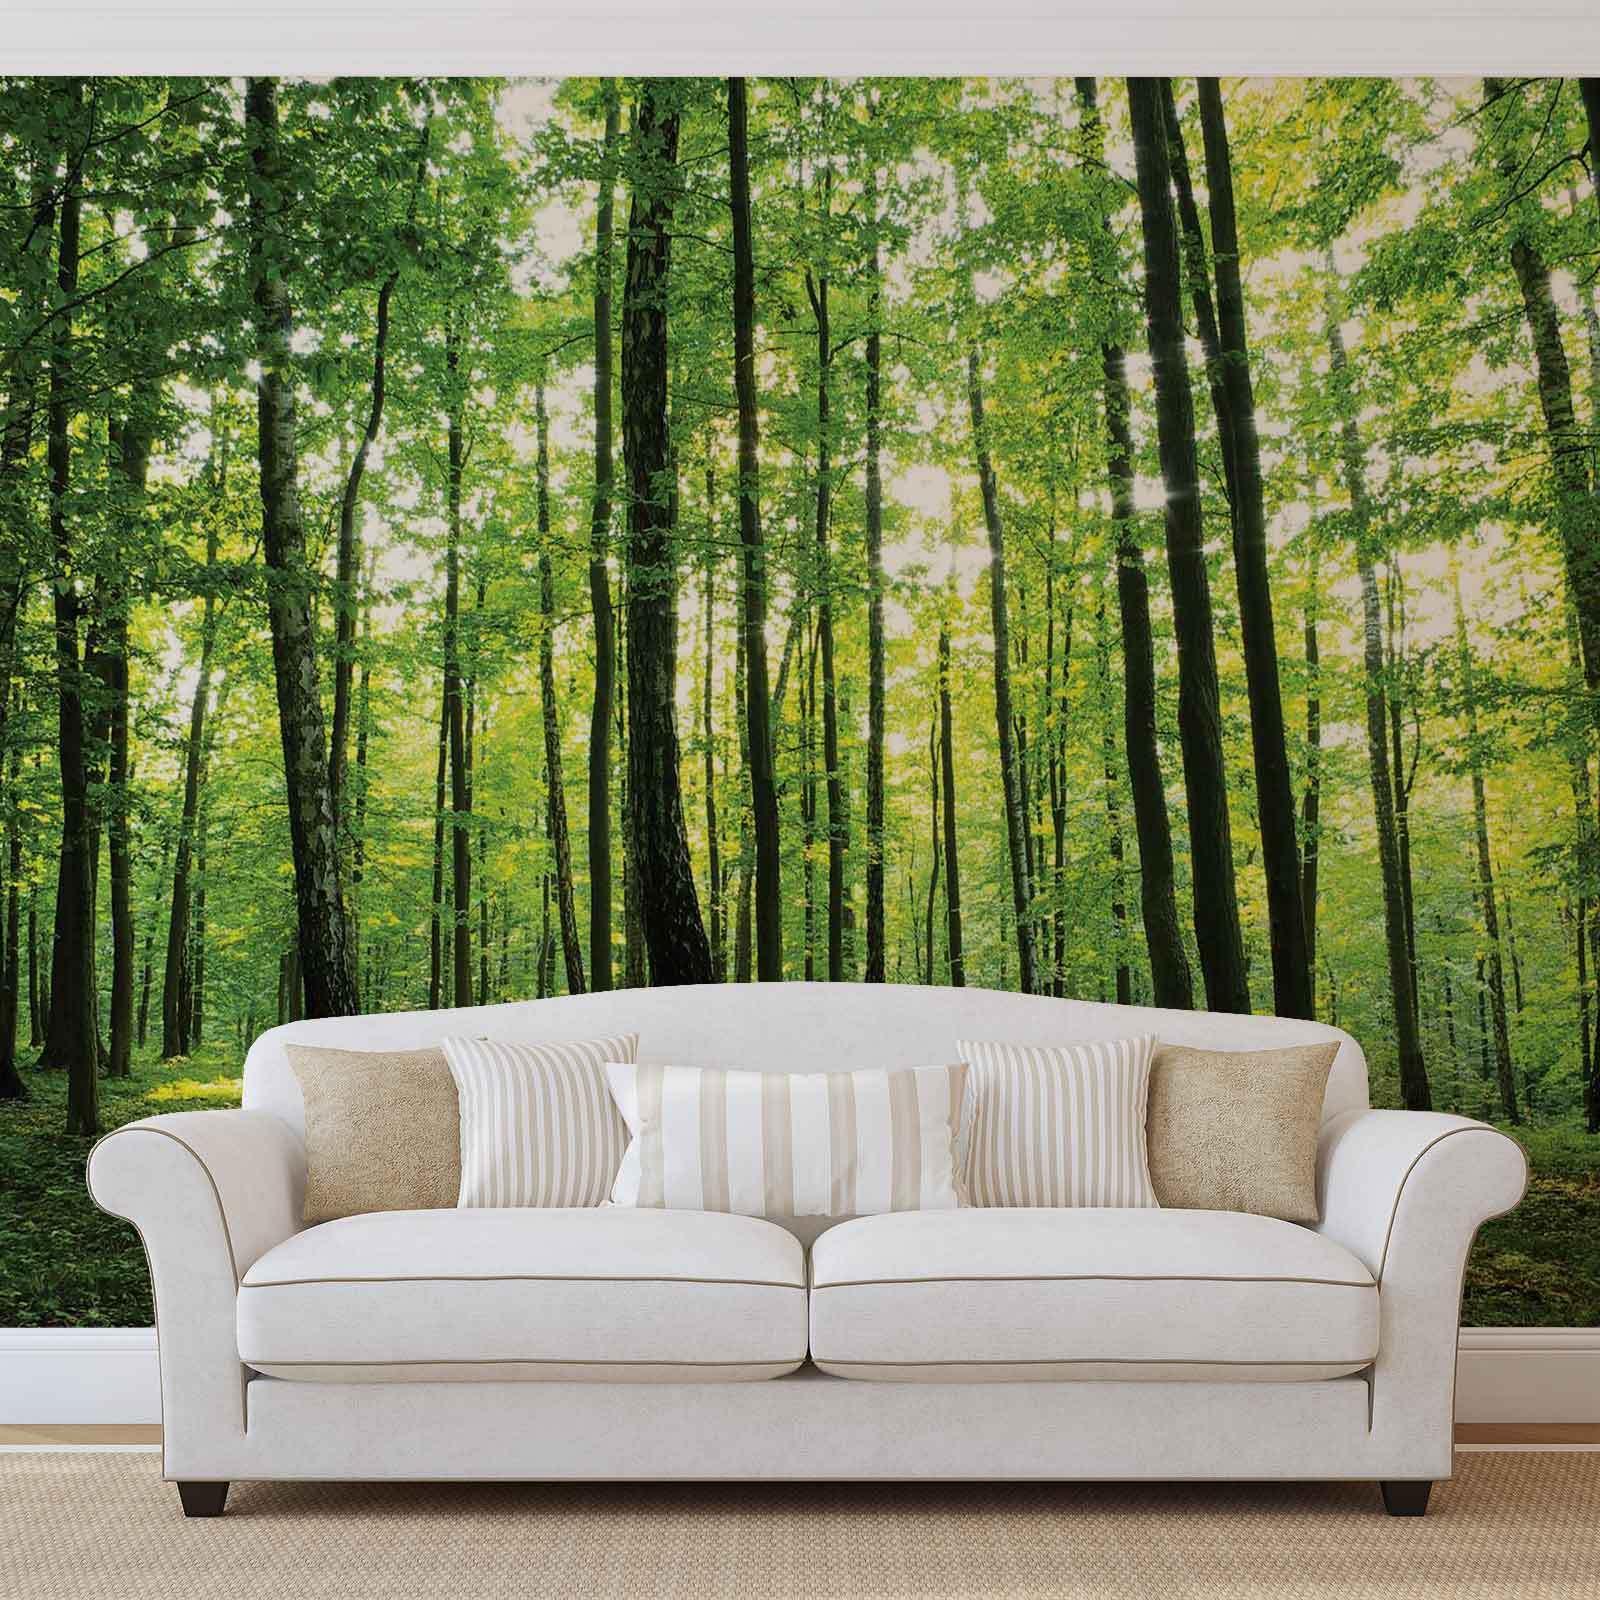 VLIES FOTOTAPETE FOTOTAPETEN WANDBILD BILD TAPETE 186VE Wald Bäume